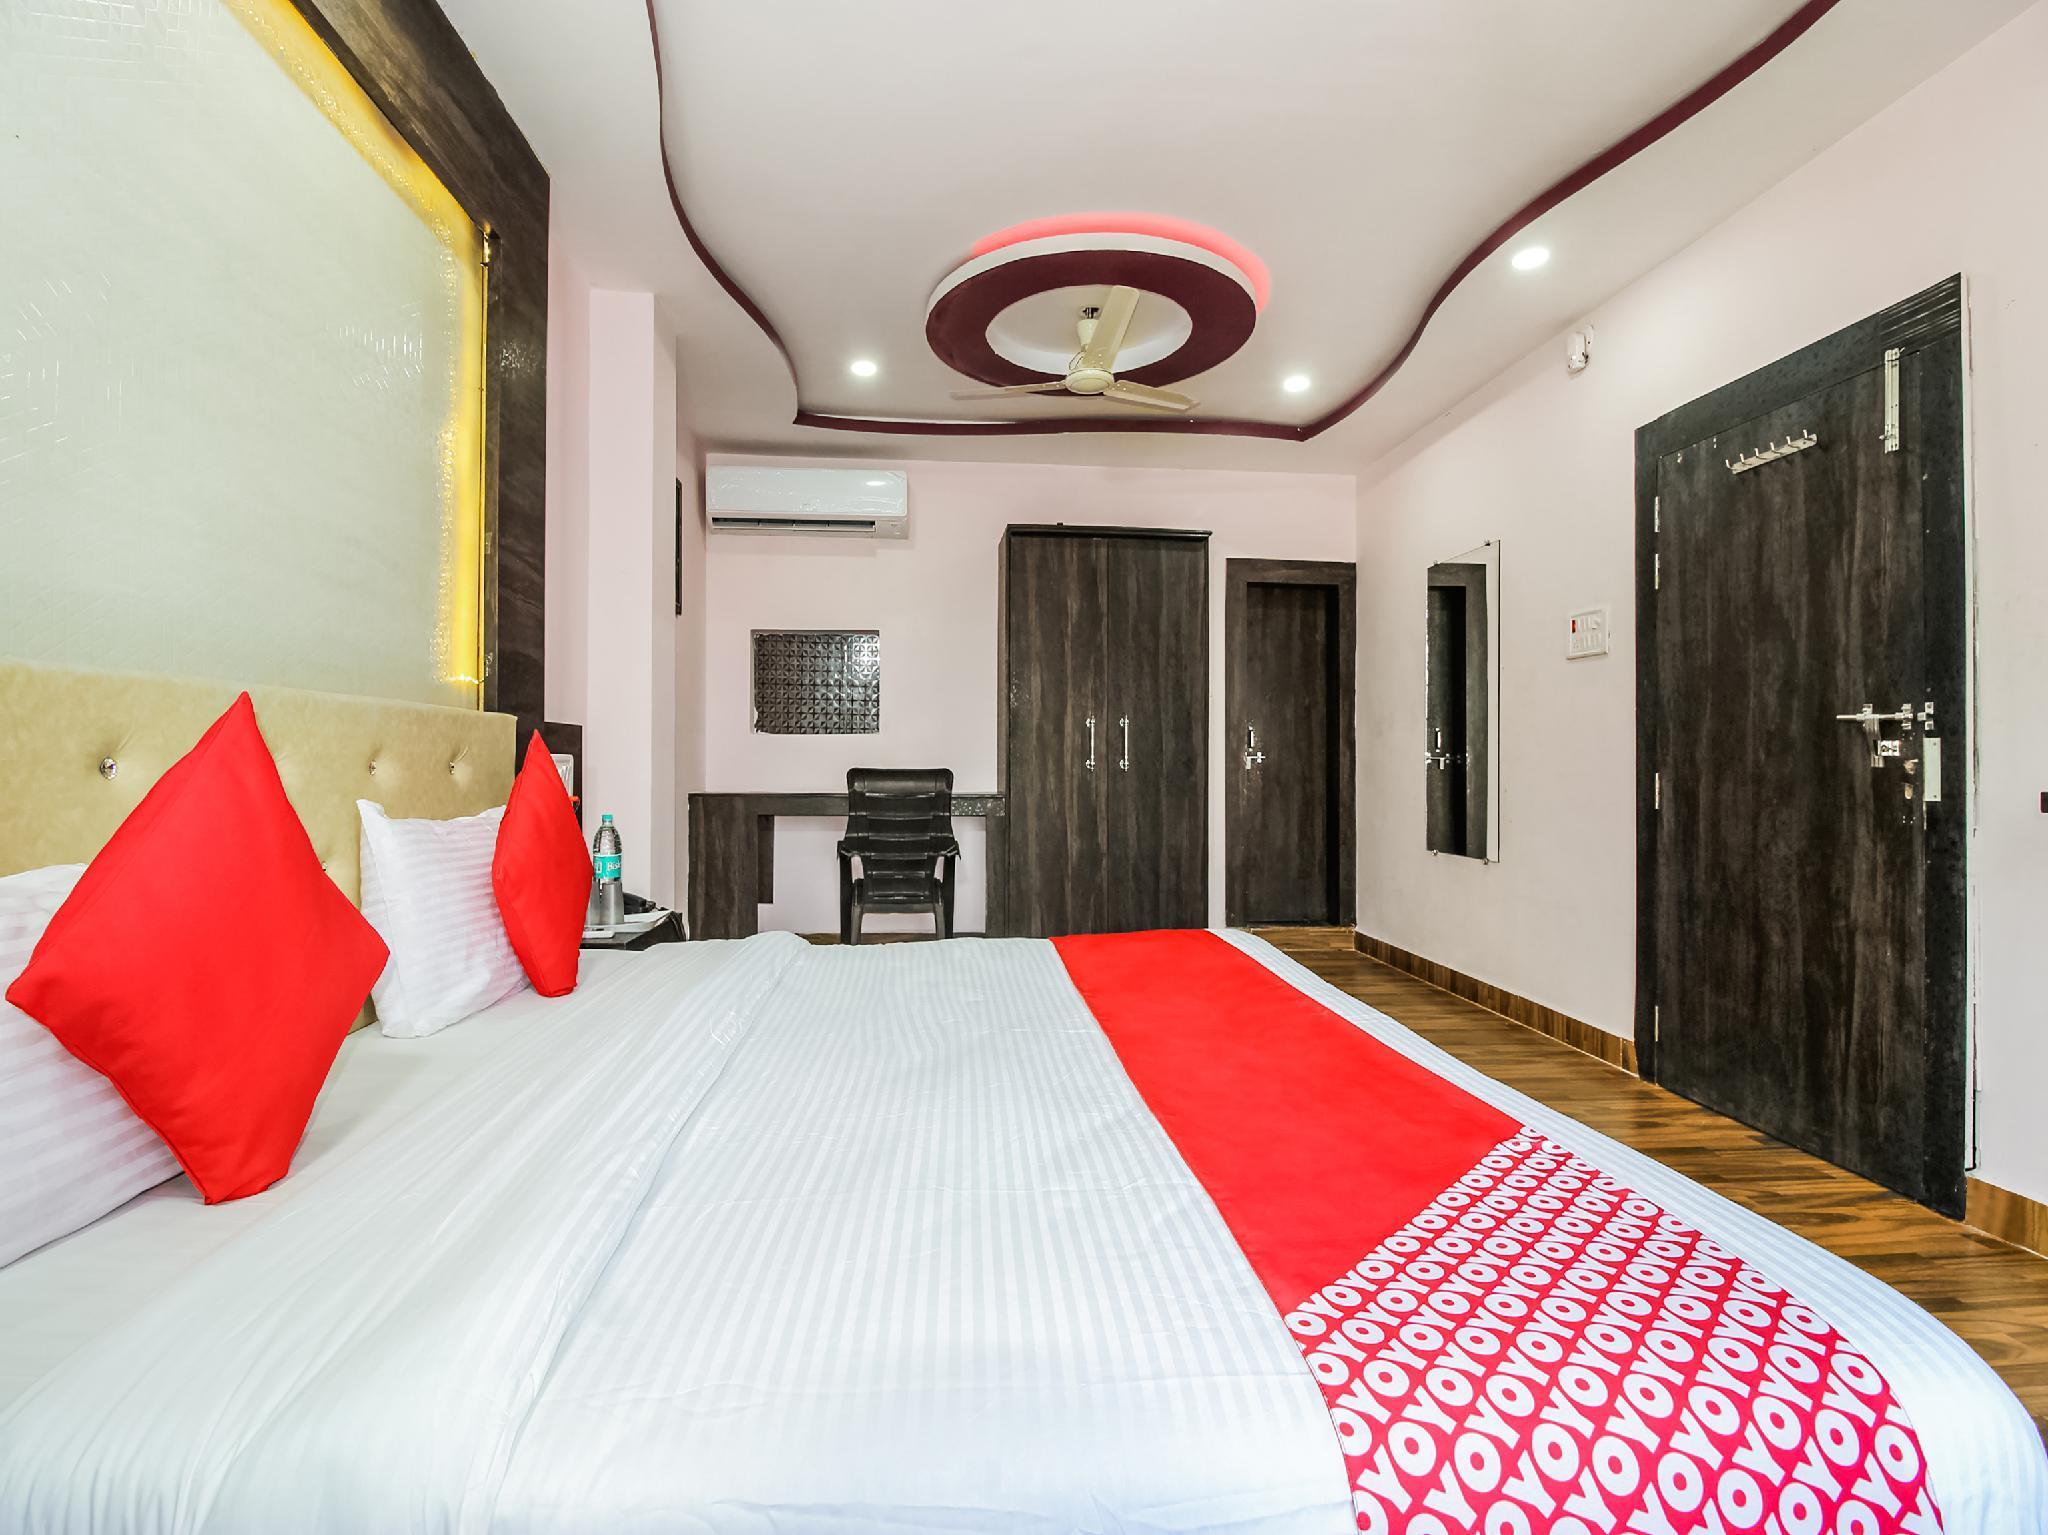 OYO 40486 Hotel Shree Bhagwat Dham